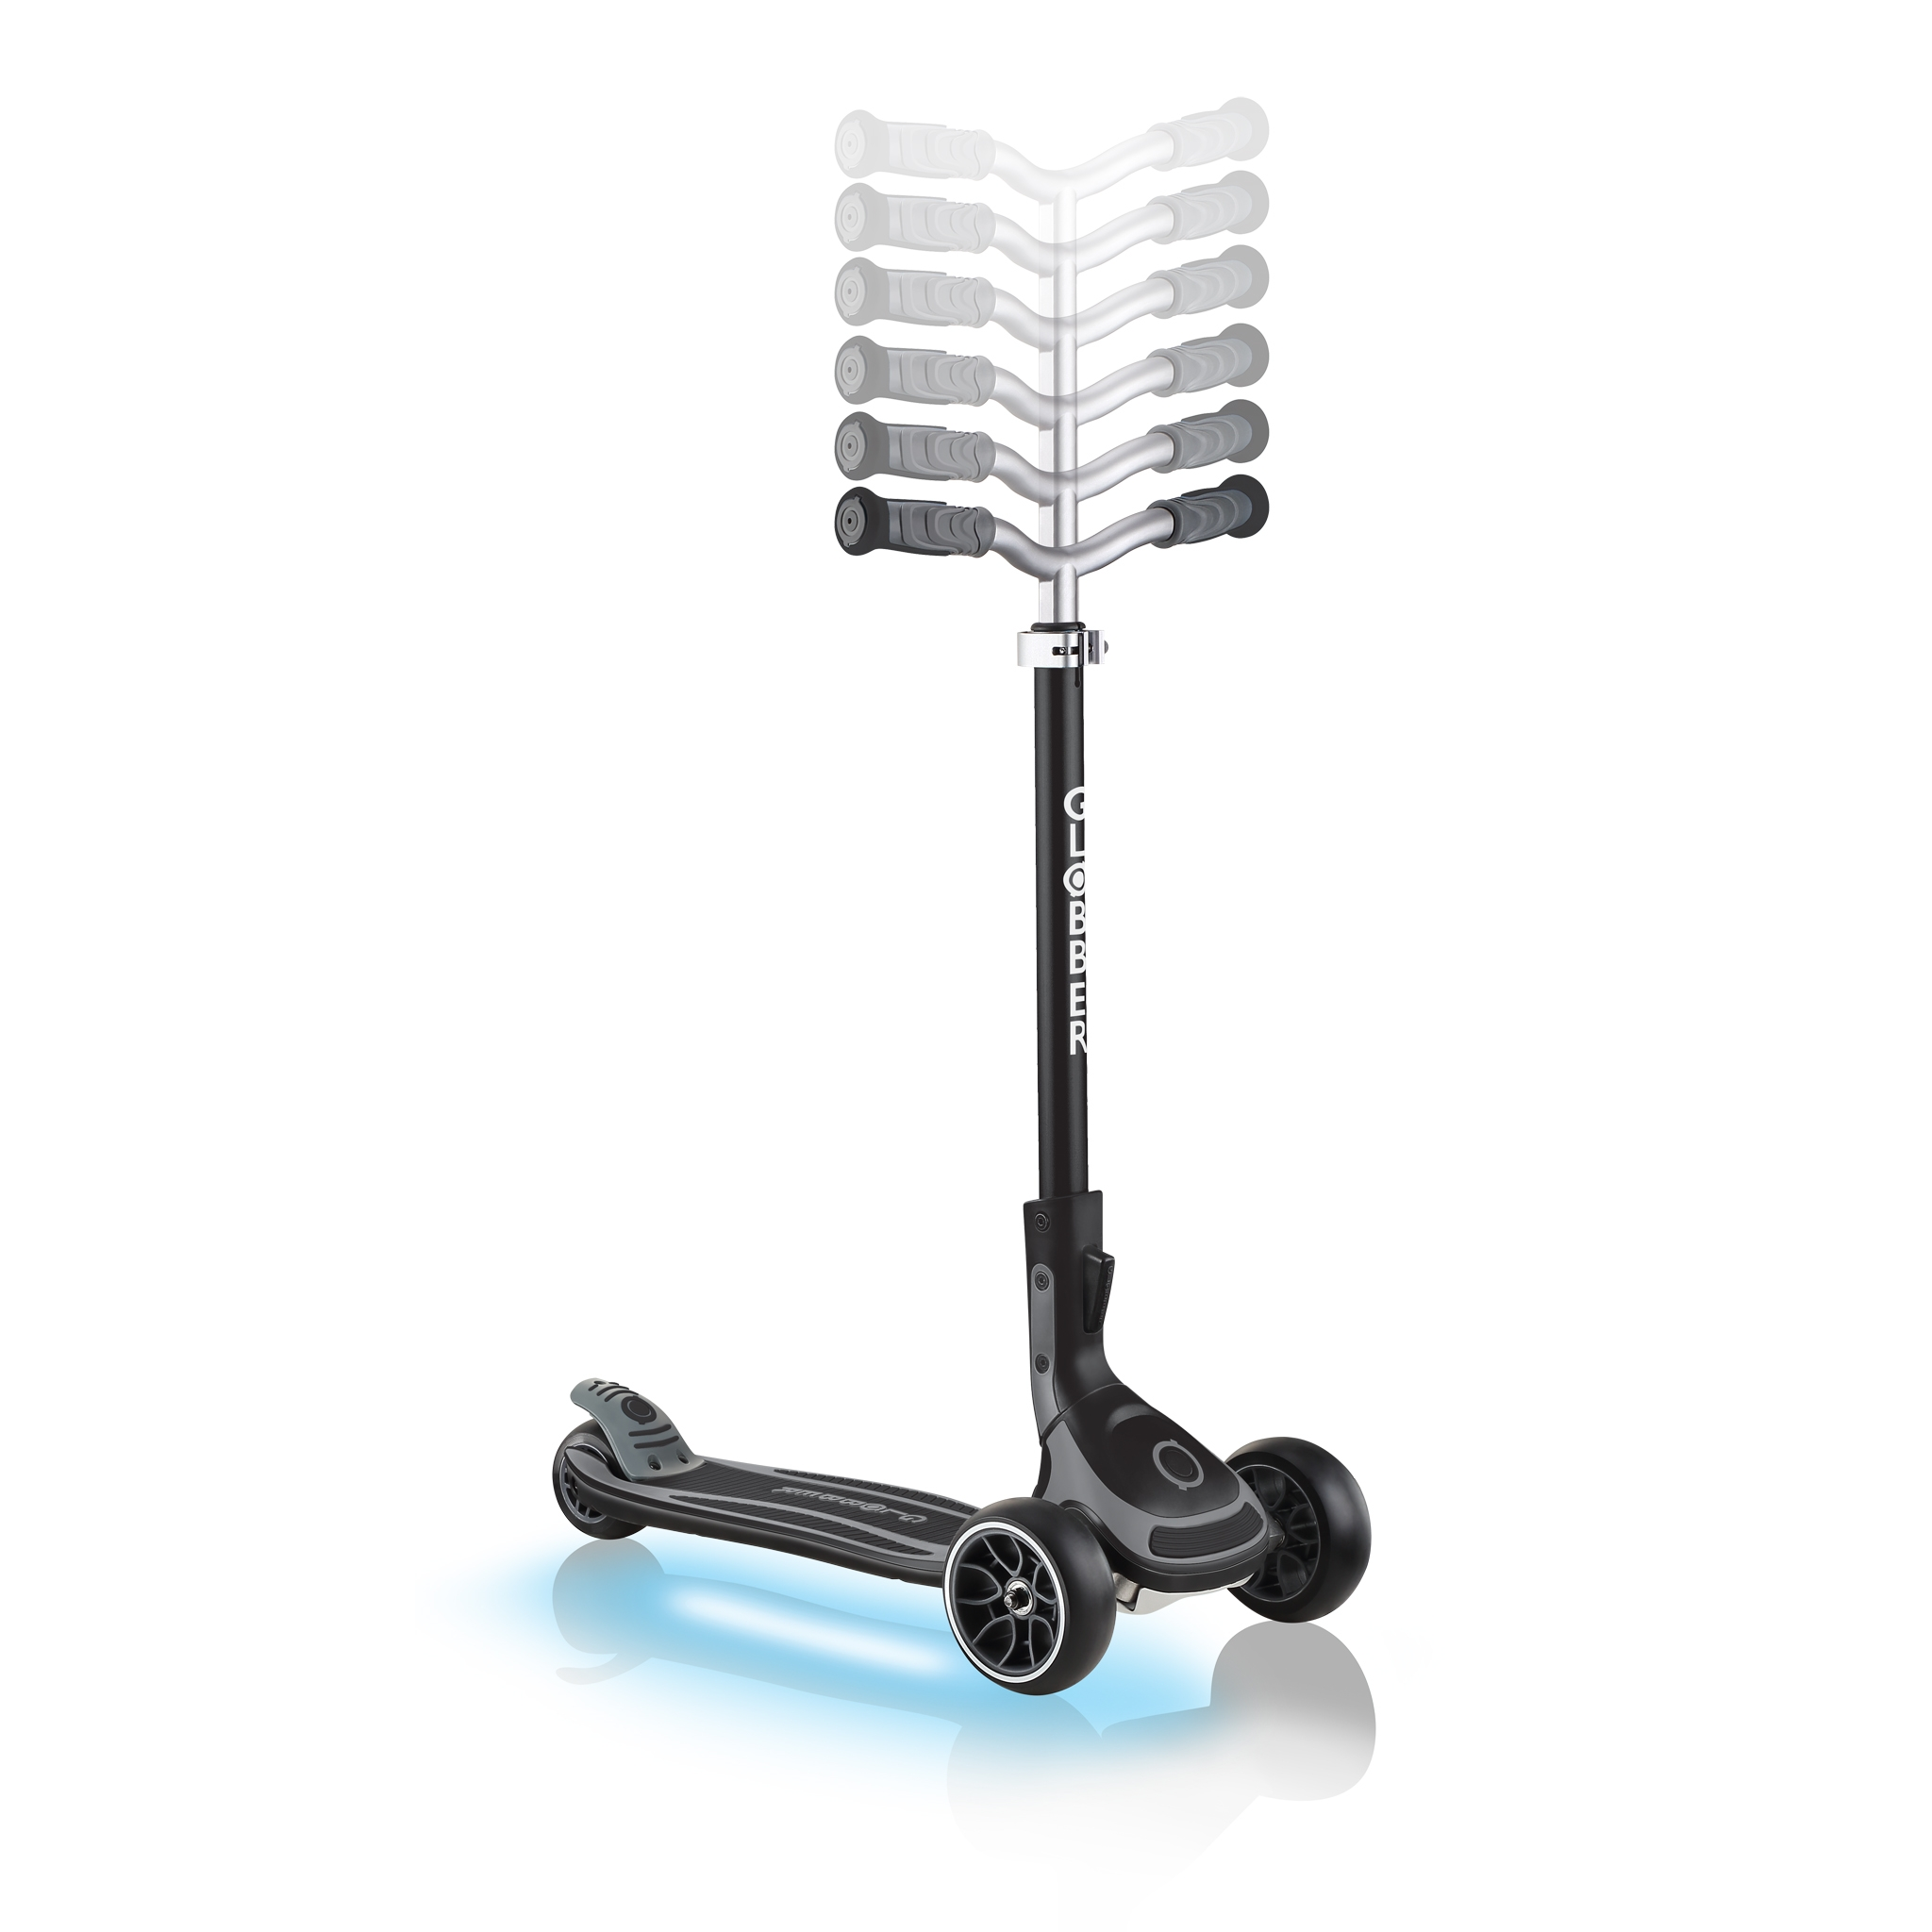 ULTIMUM-LIGHTS-adjustable-scooter-for-kids-and-teens-black 1